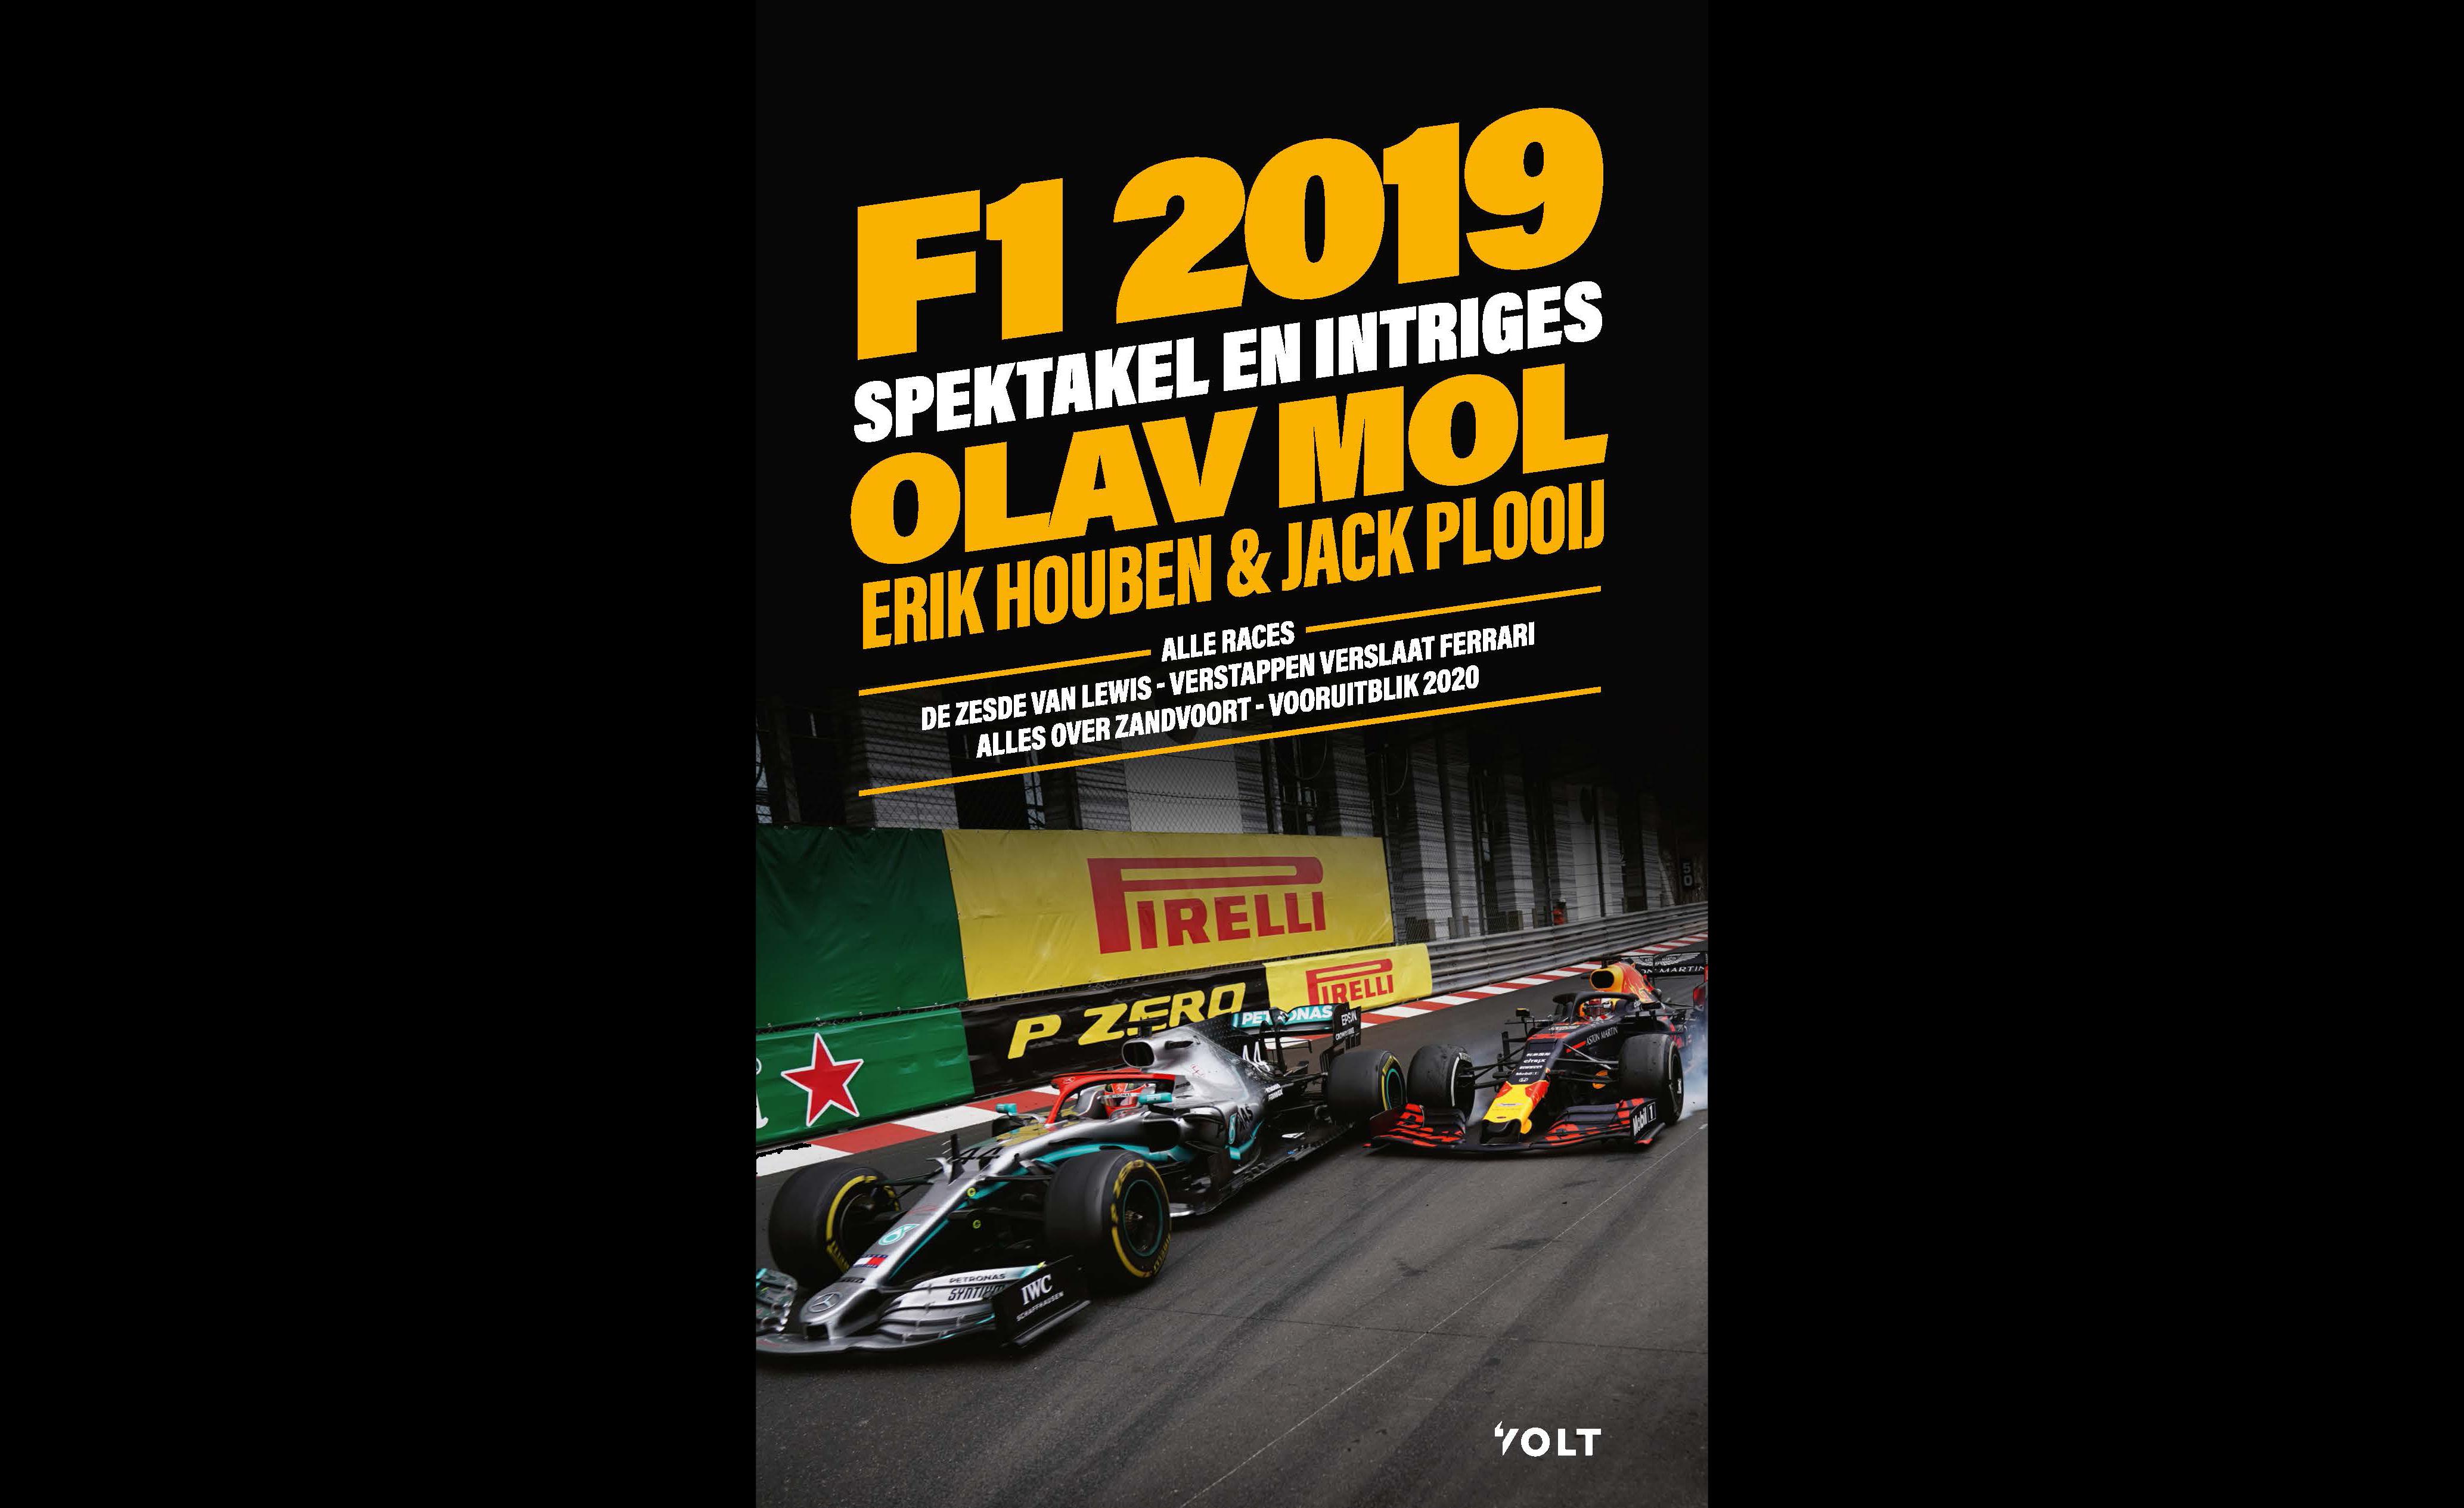 F1 2019 Olav Mol Formule 1